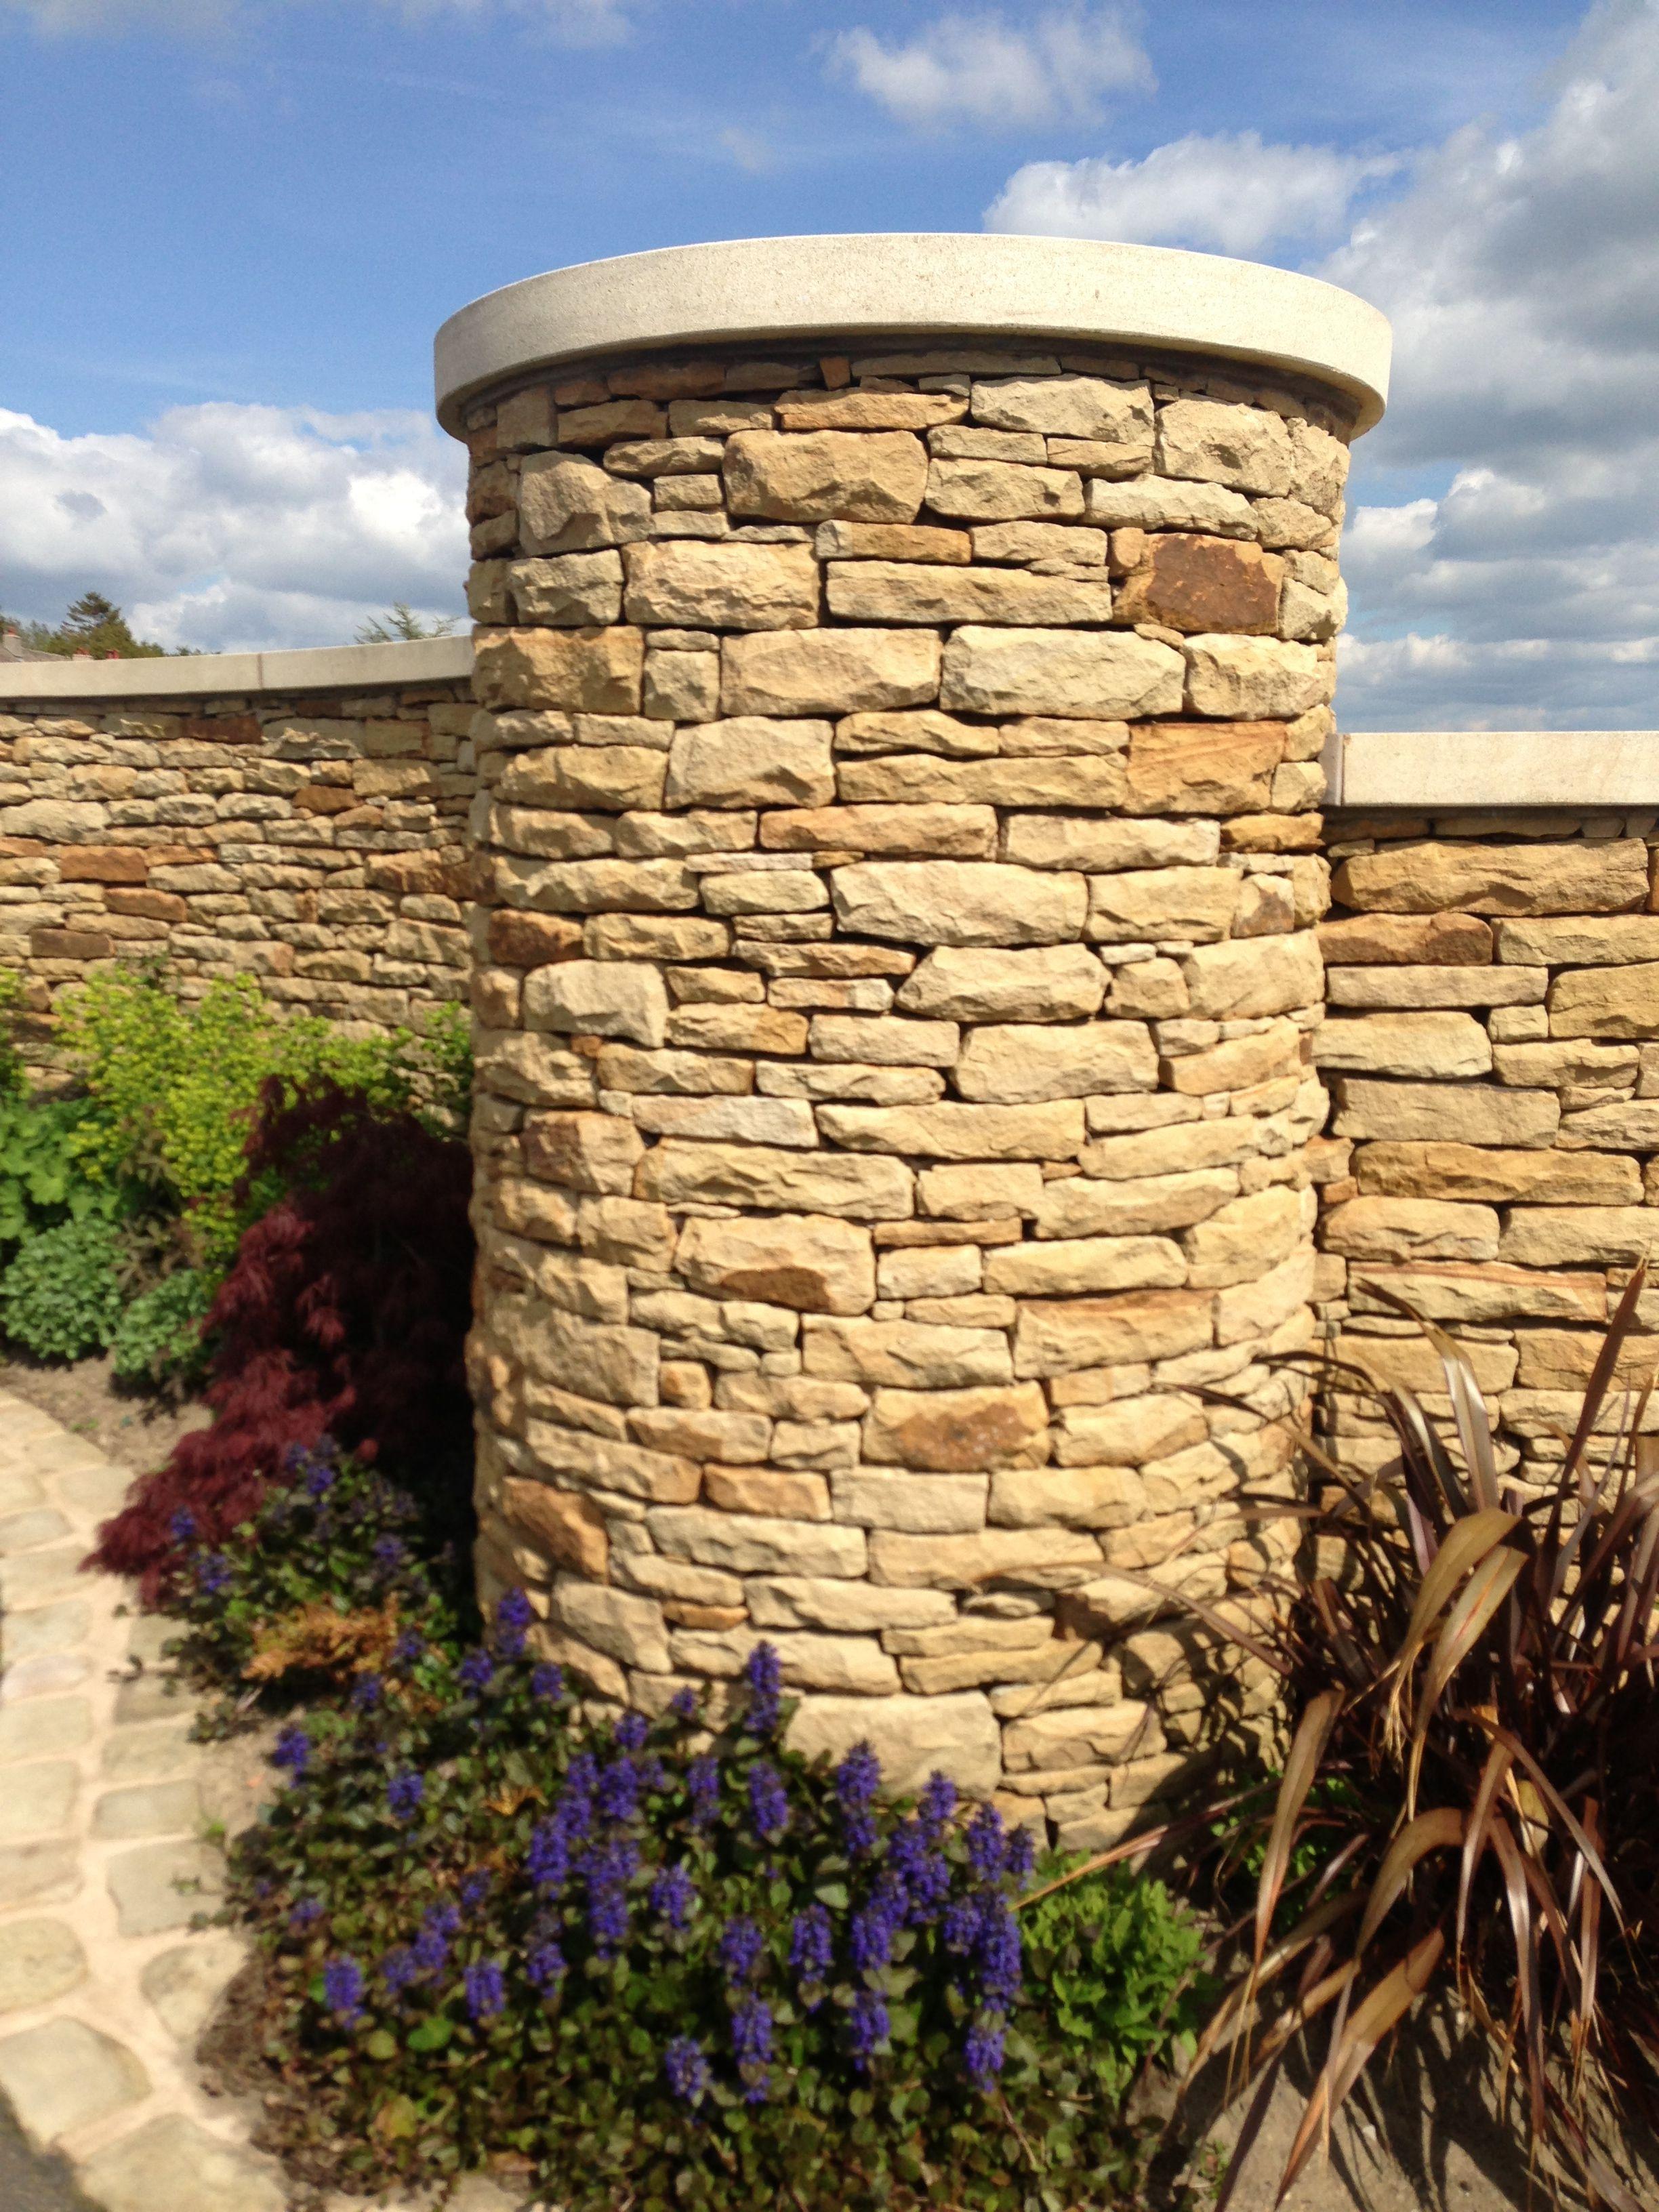 Circular Dry Stone Walling Stone Masonry Dry Stone Wall Exterior